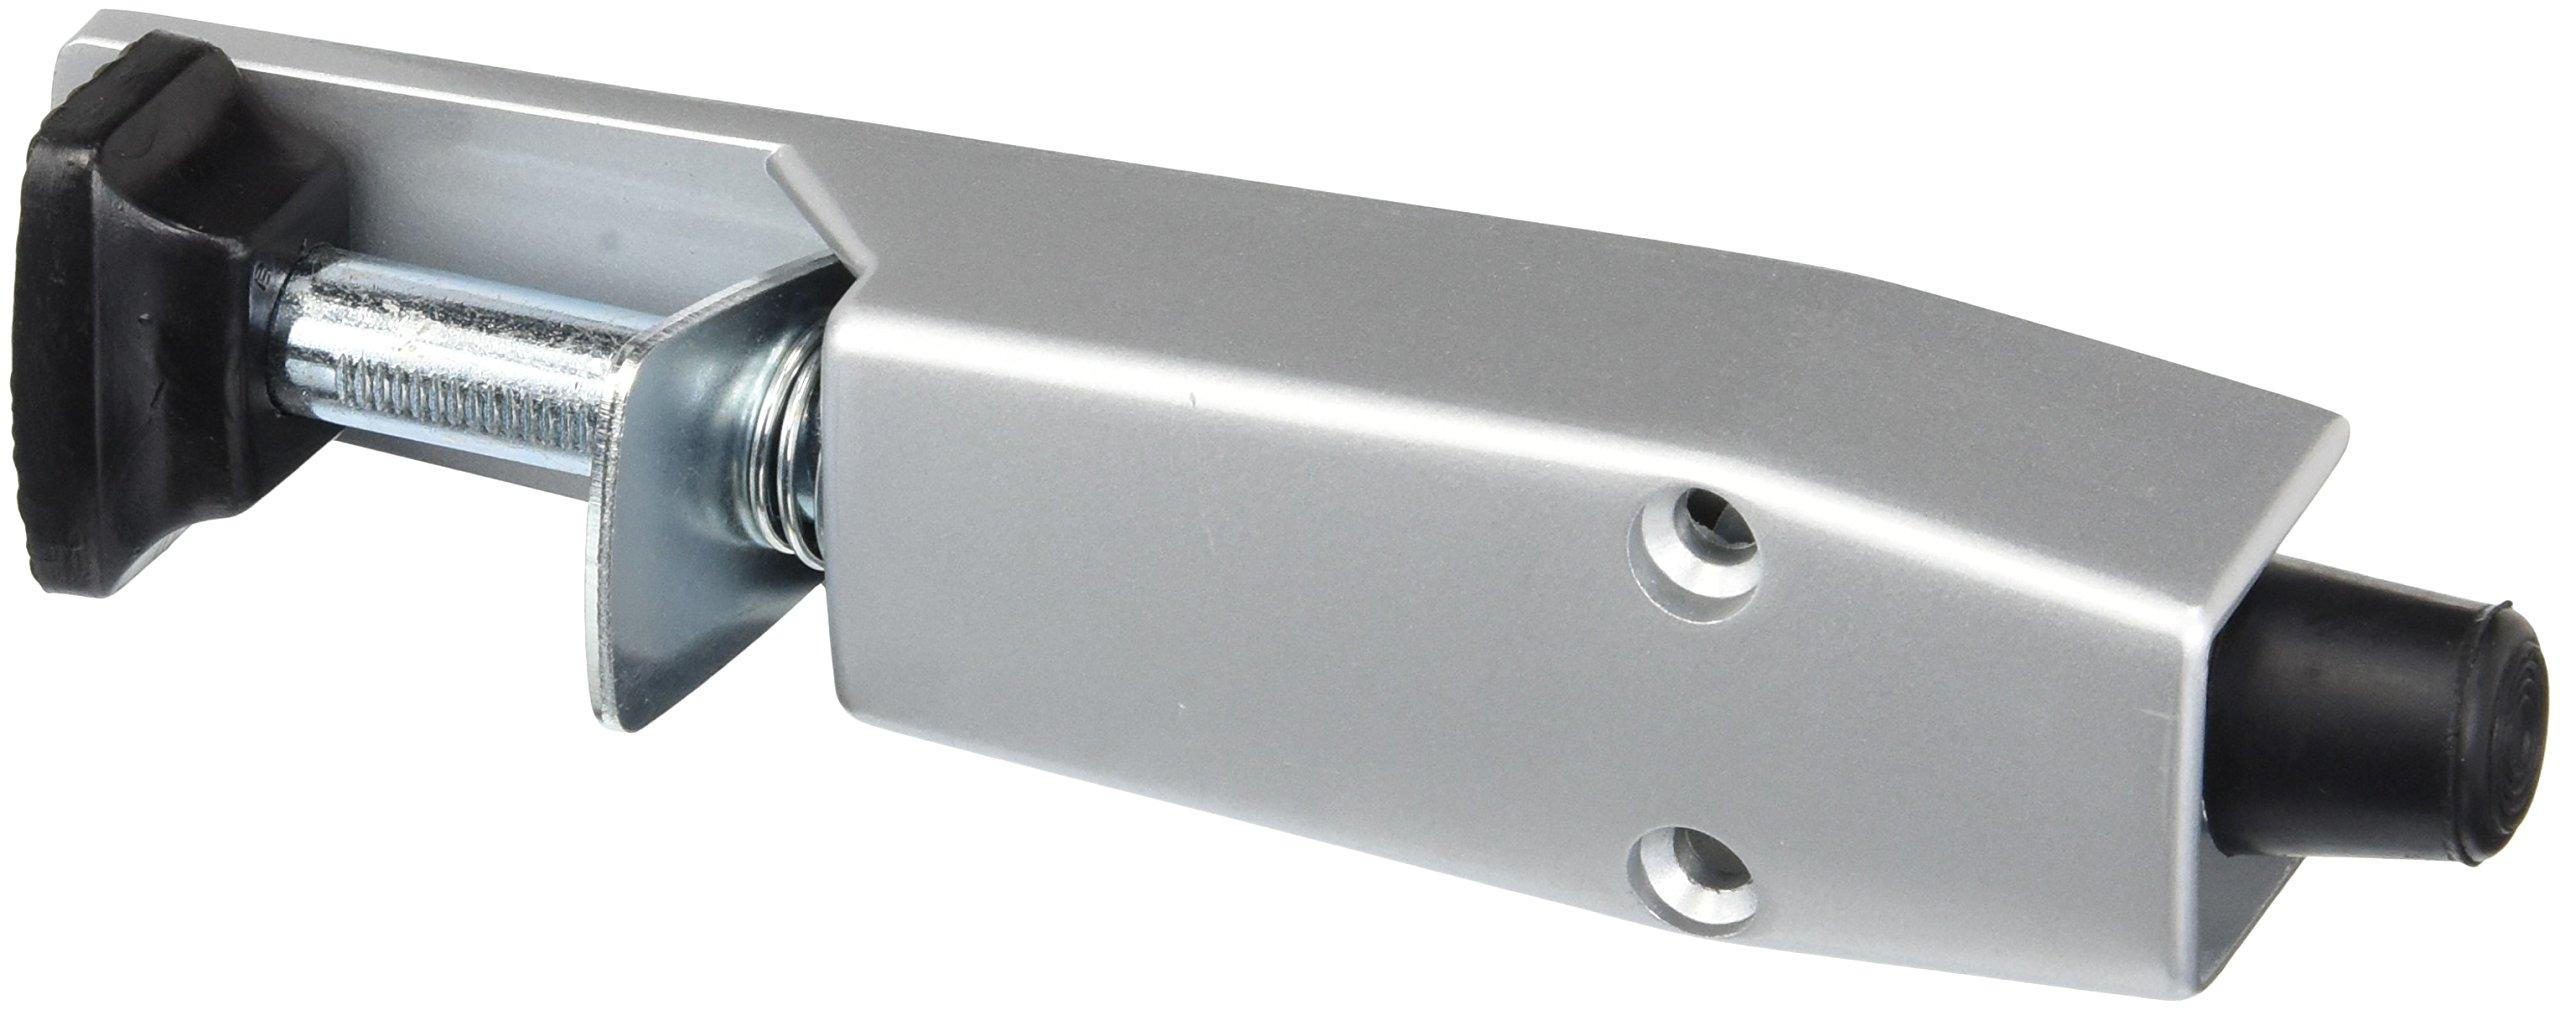 Ultra Hardware 36030 Step On Door Holder, Aluminum